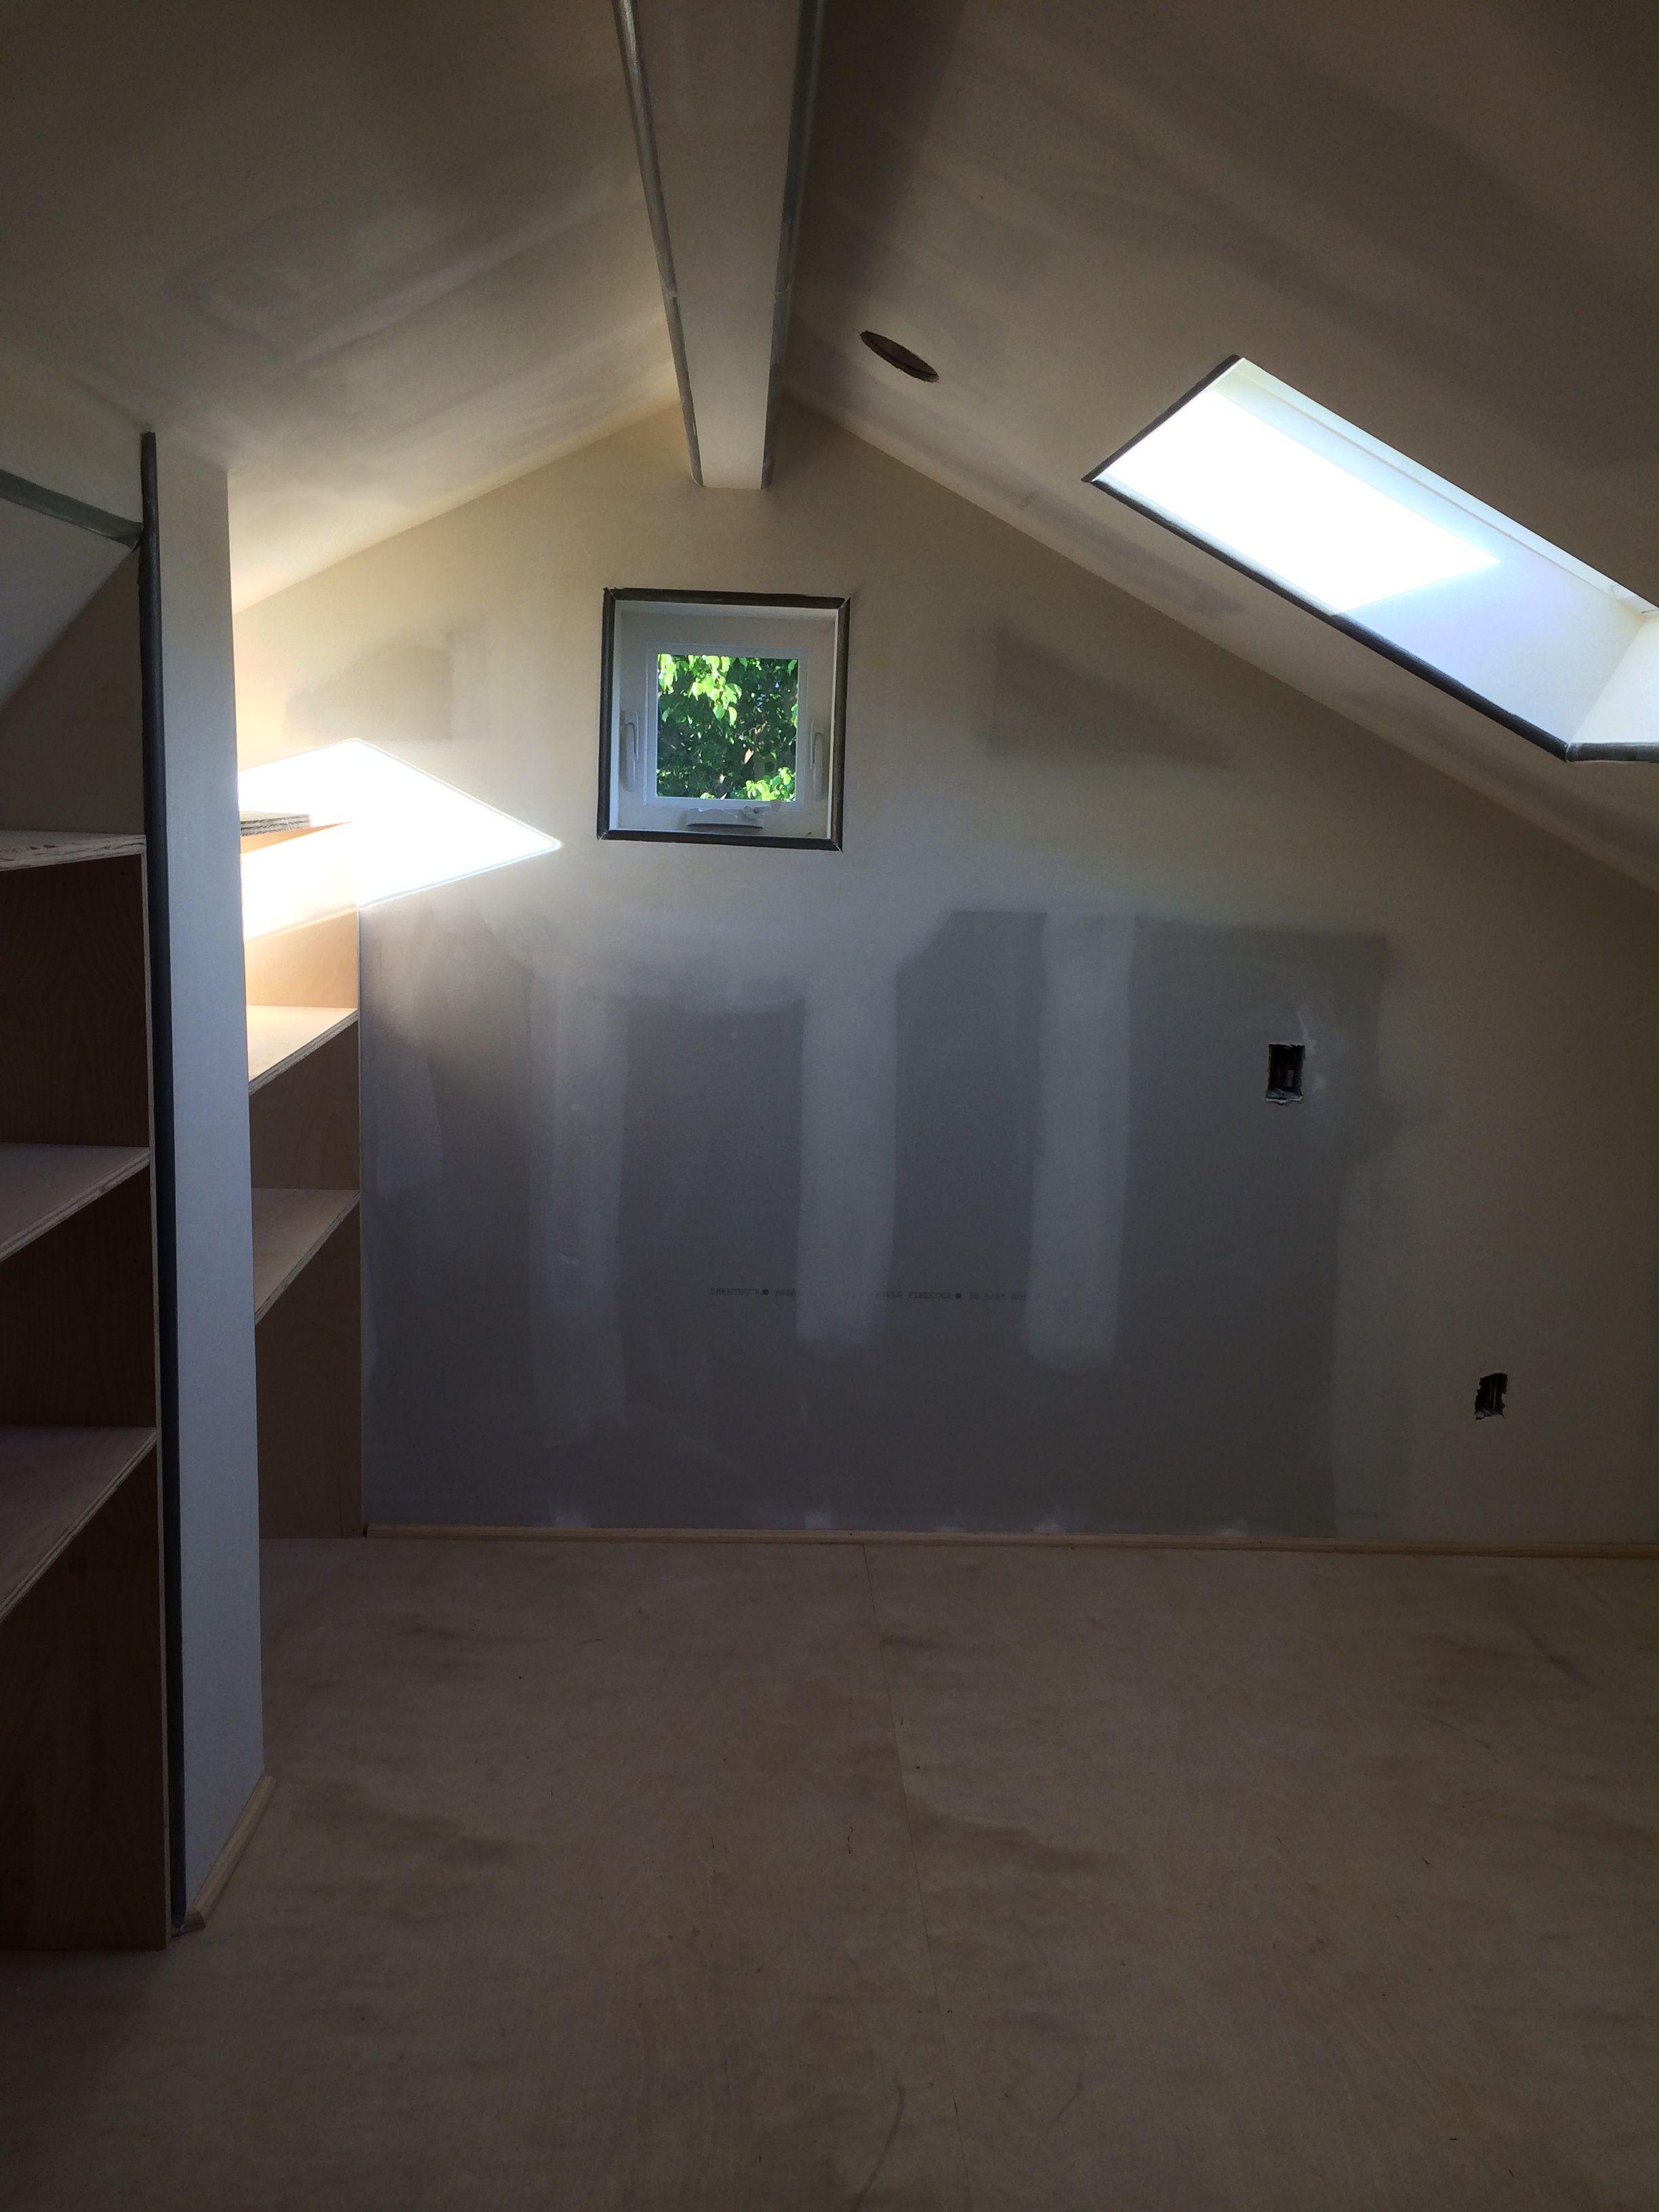 Attic Loft Project 8 Bookshelves And Baseboard Attic Loft Loft Baseboards